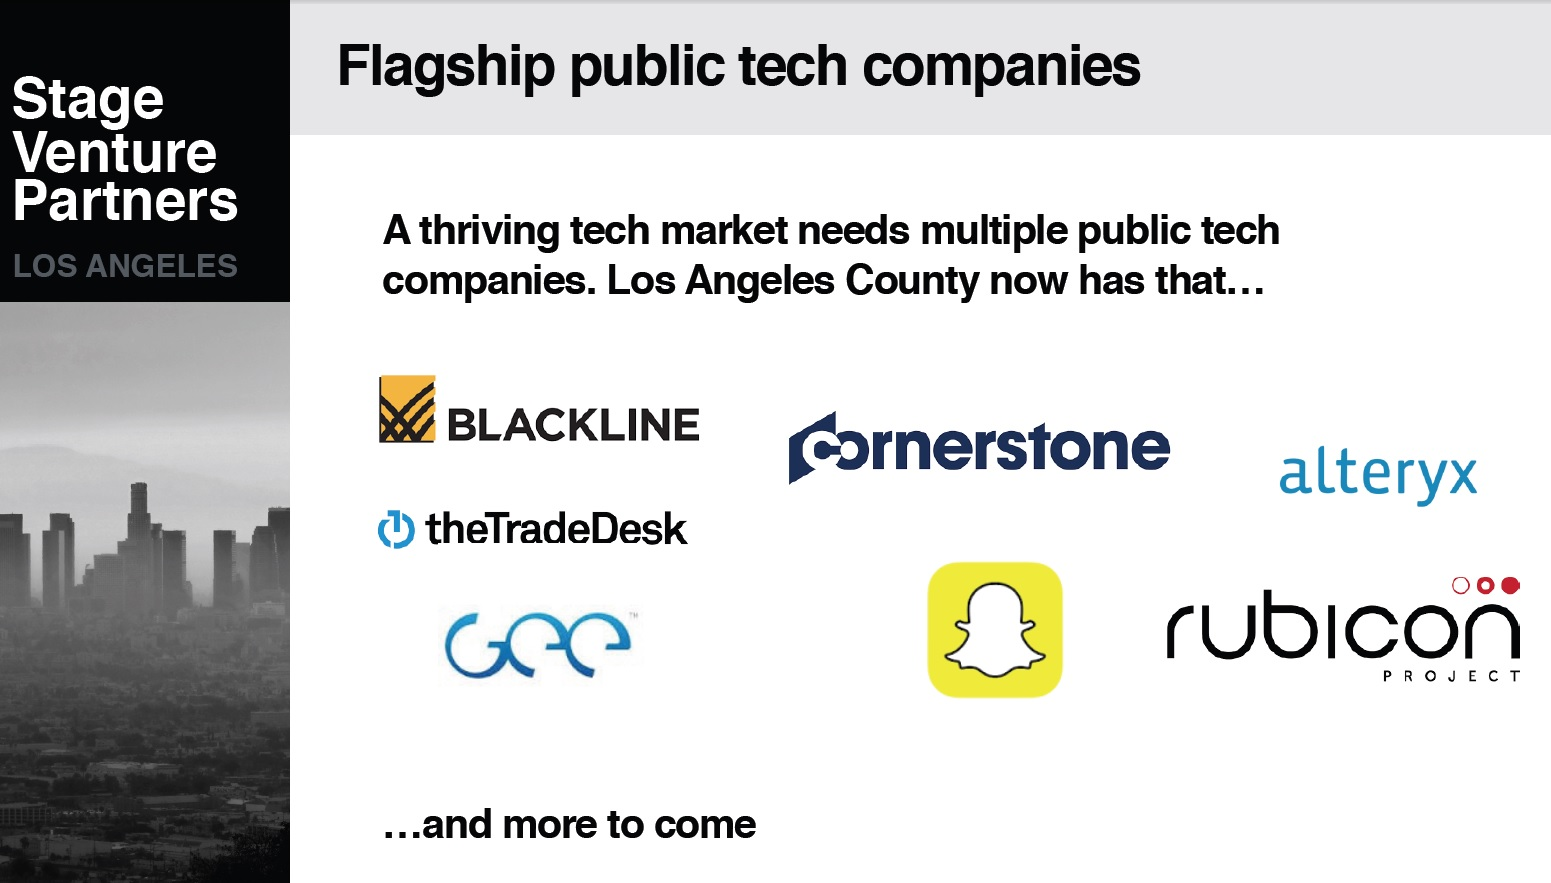 LA Venture Capital Landscape, Trends, Companies On The Move